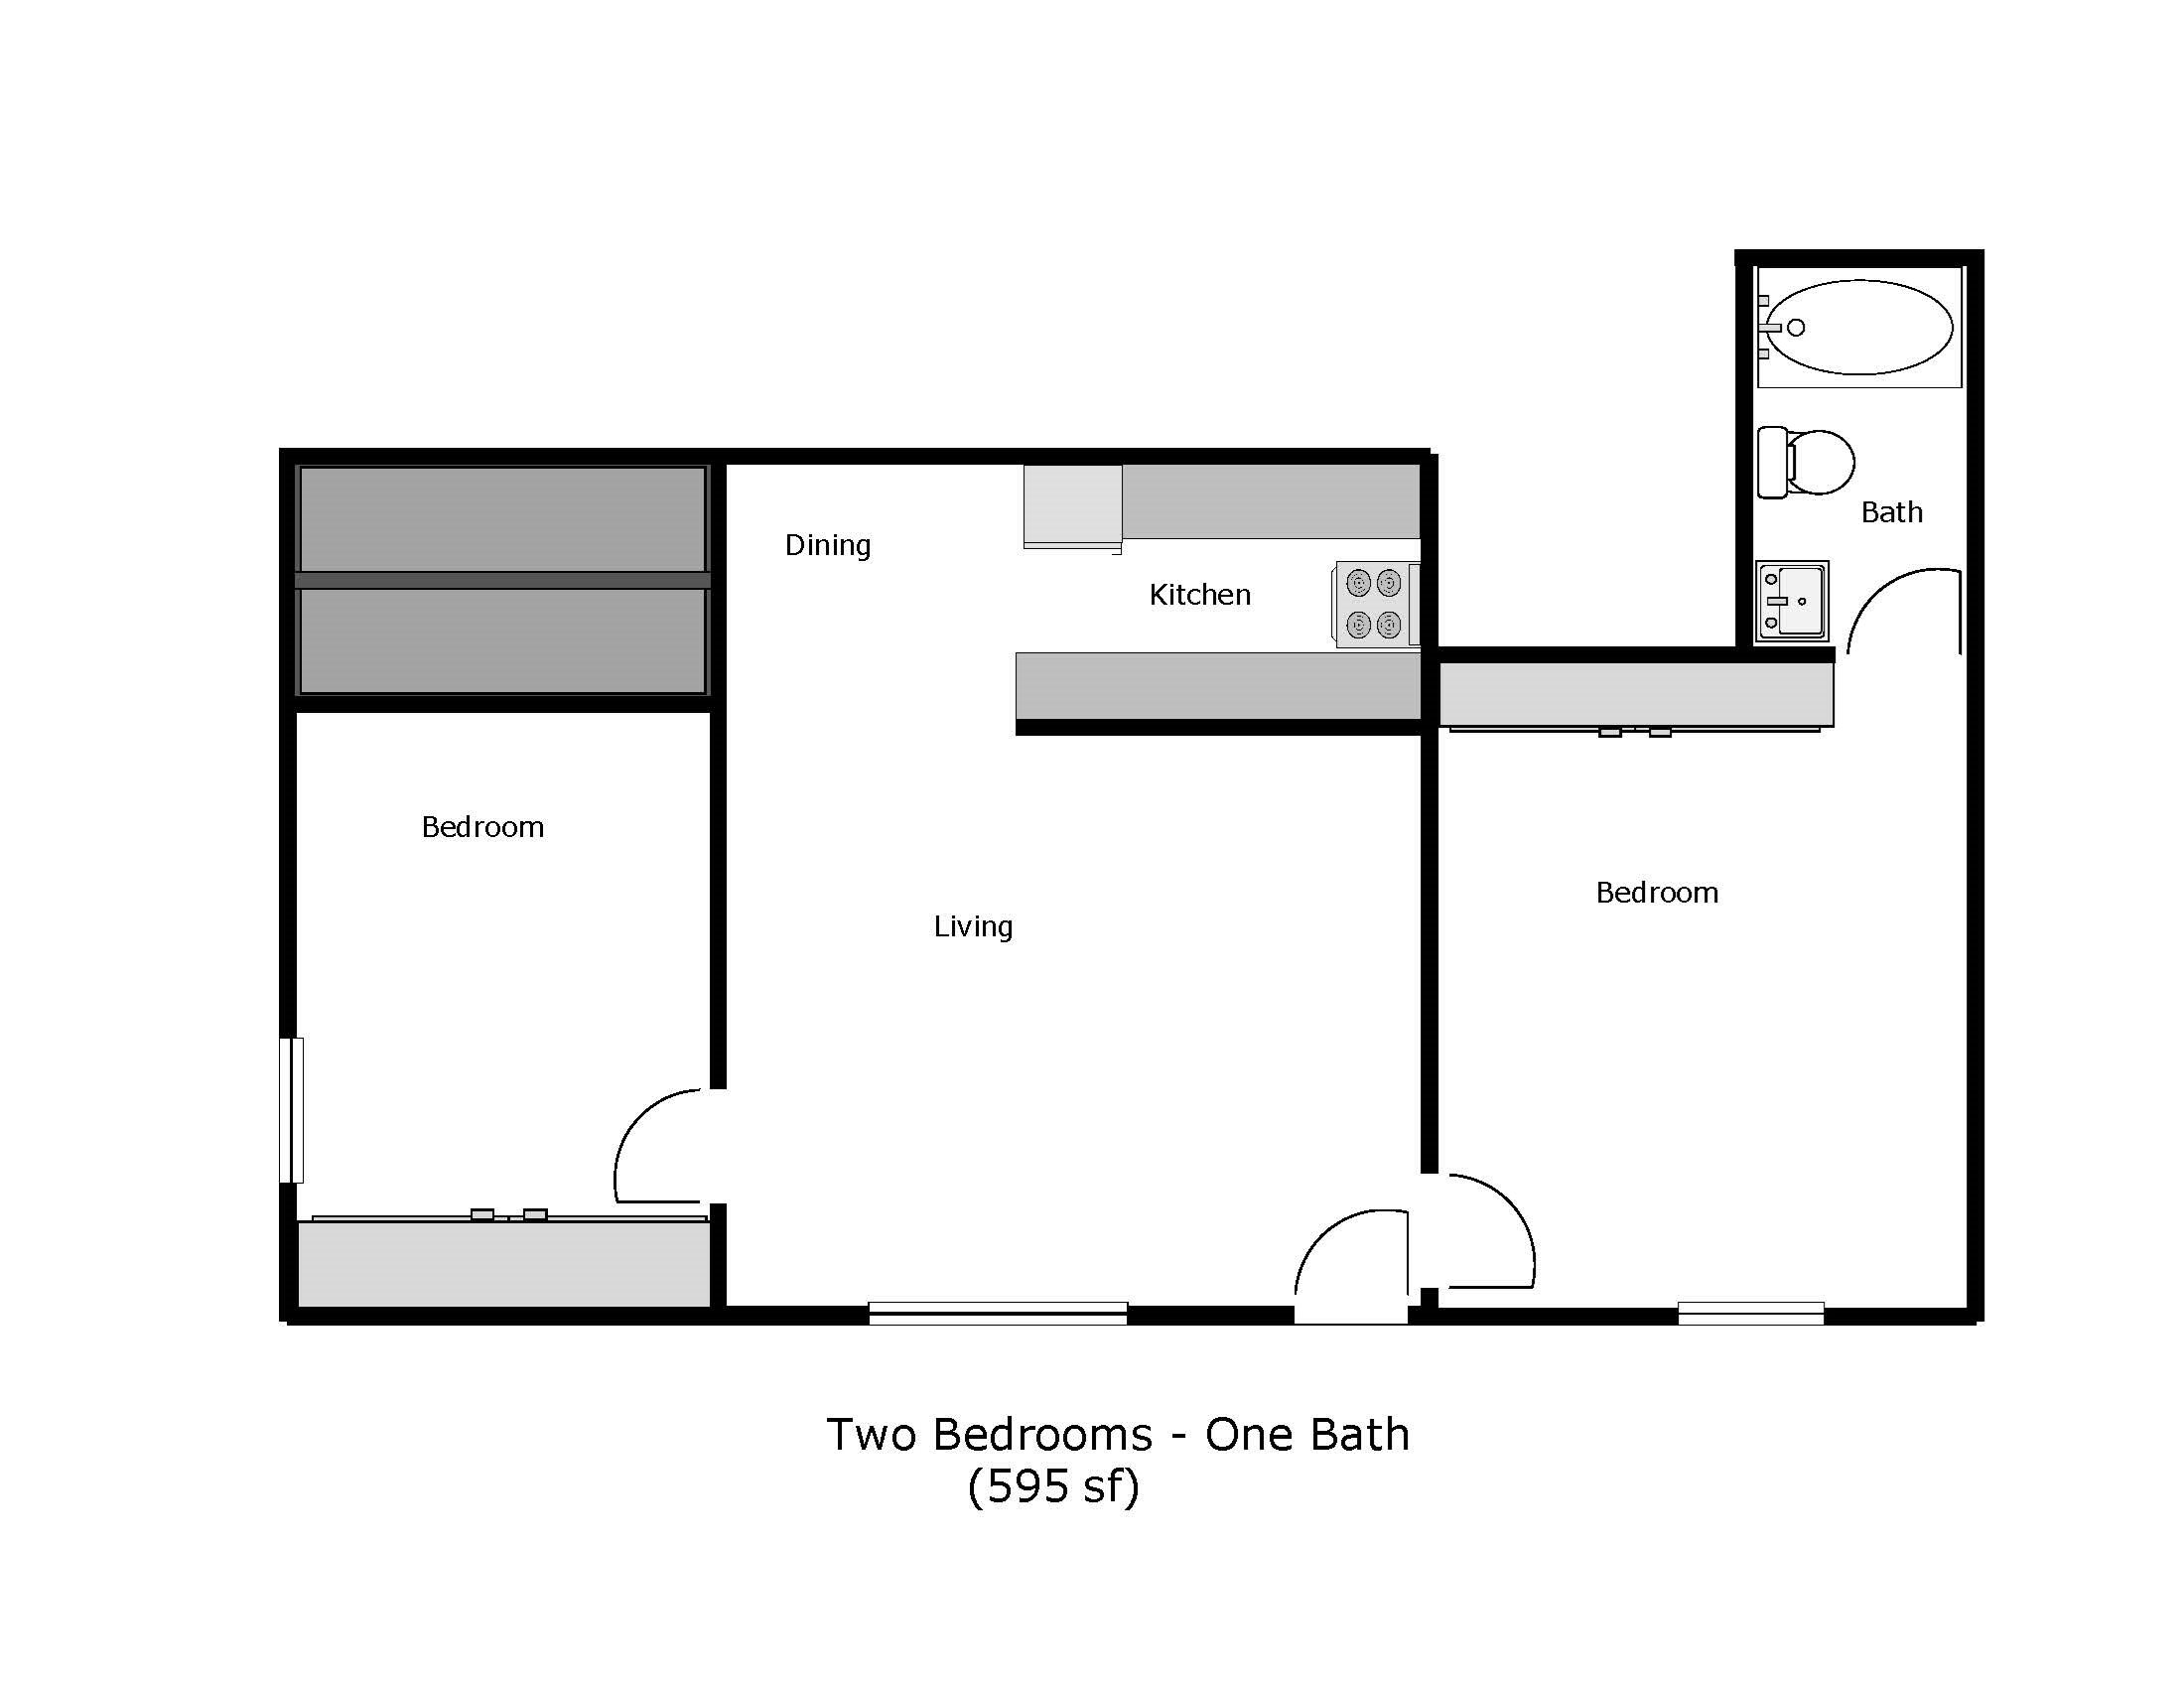 Marpel - Carpenter/Washington Street, Fairfield -  2 Bed 1 Bath Floor Plan 5